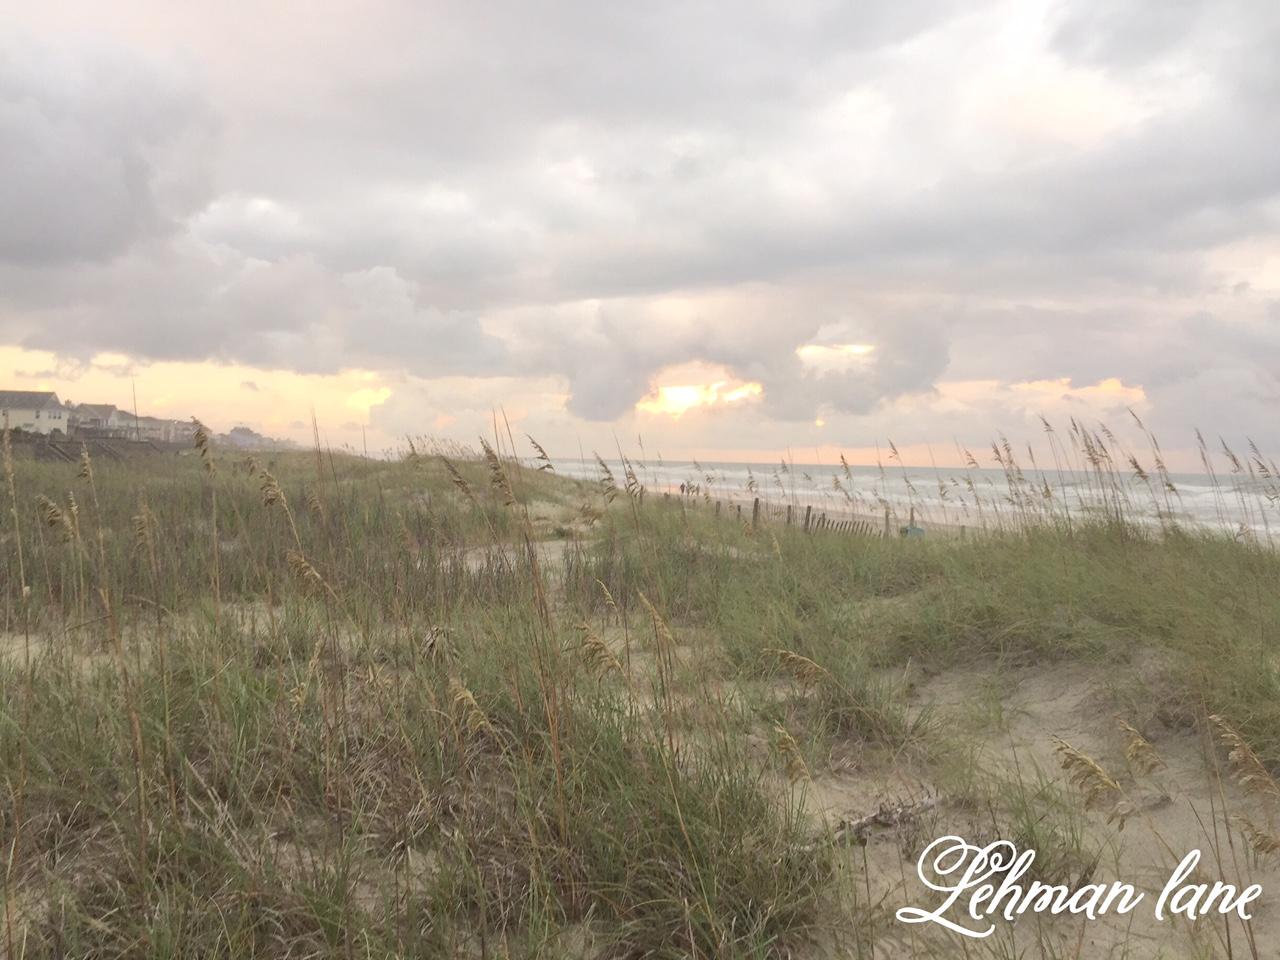 Beach Vacation - Emerald Isle, NC